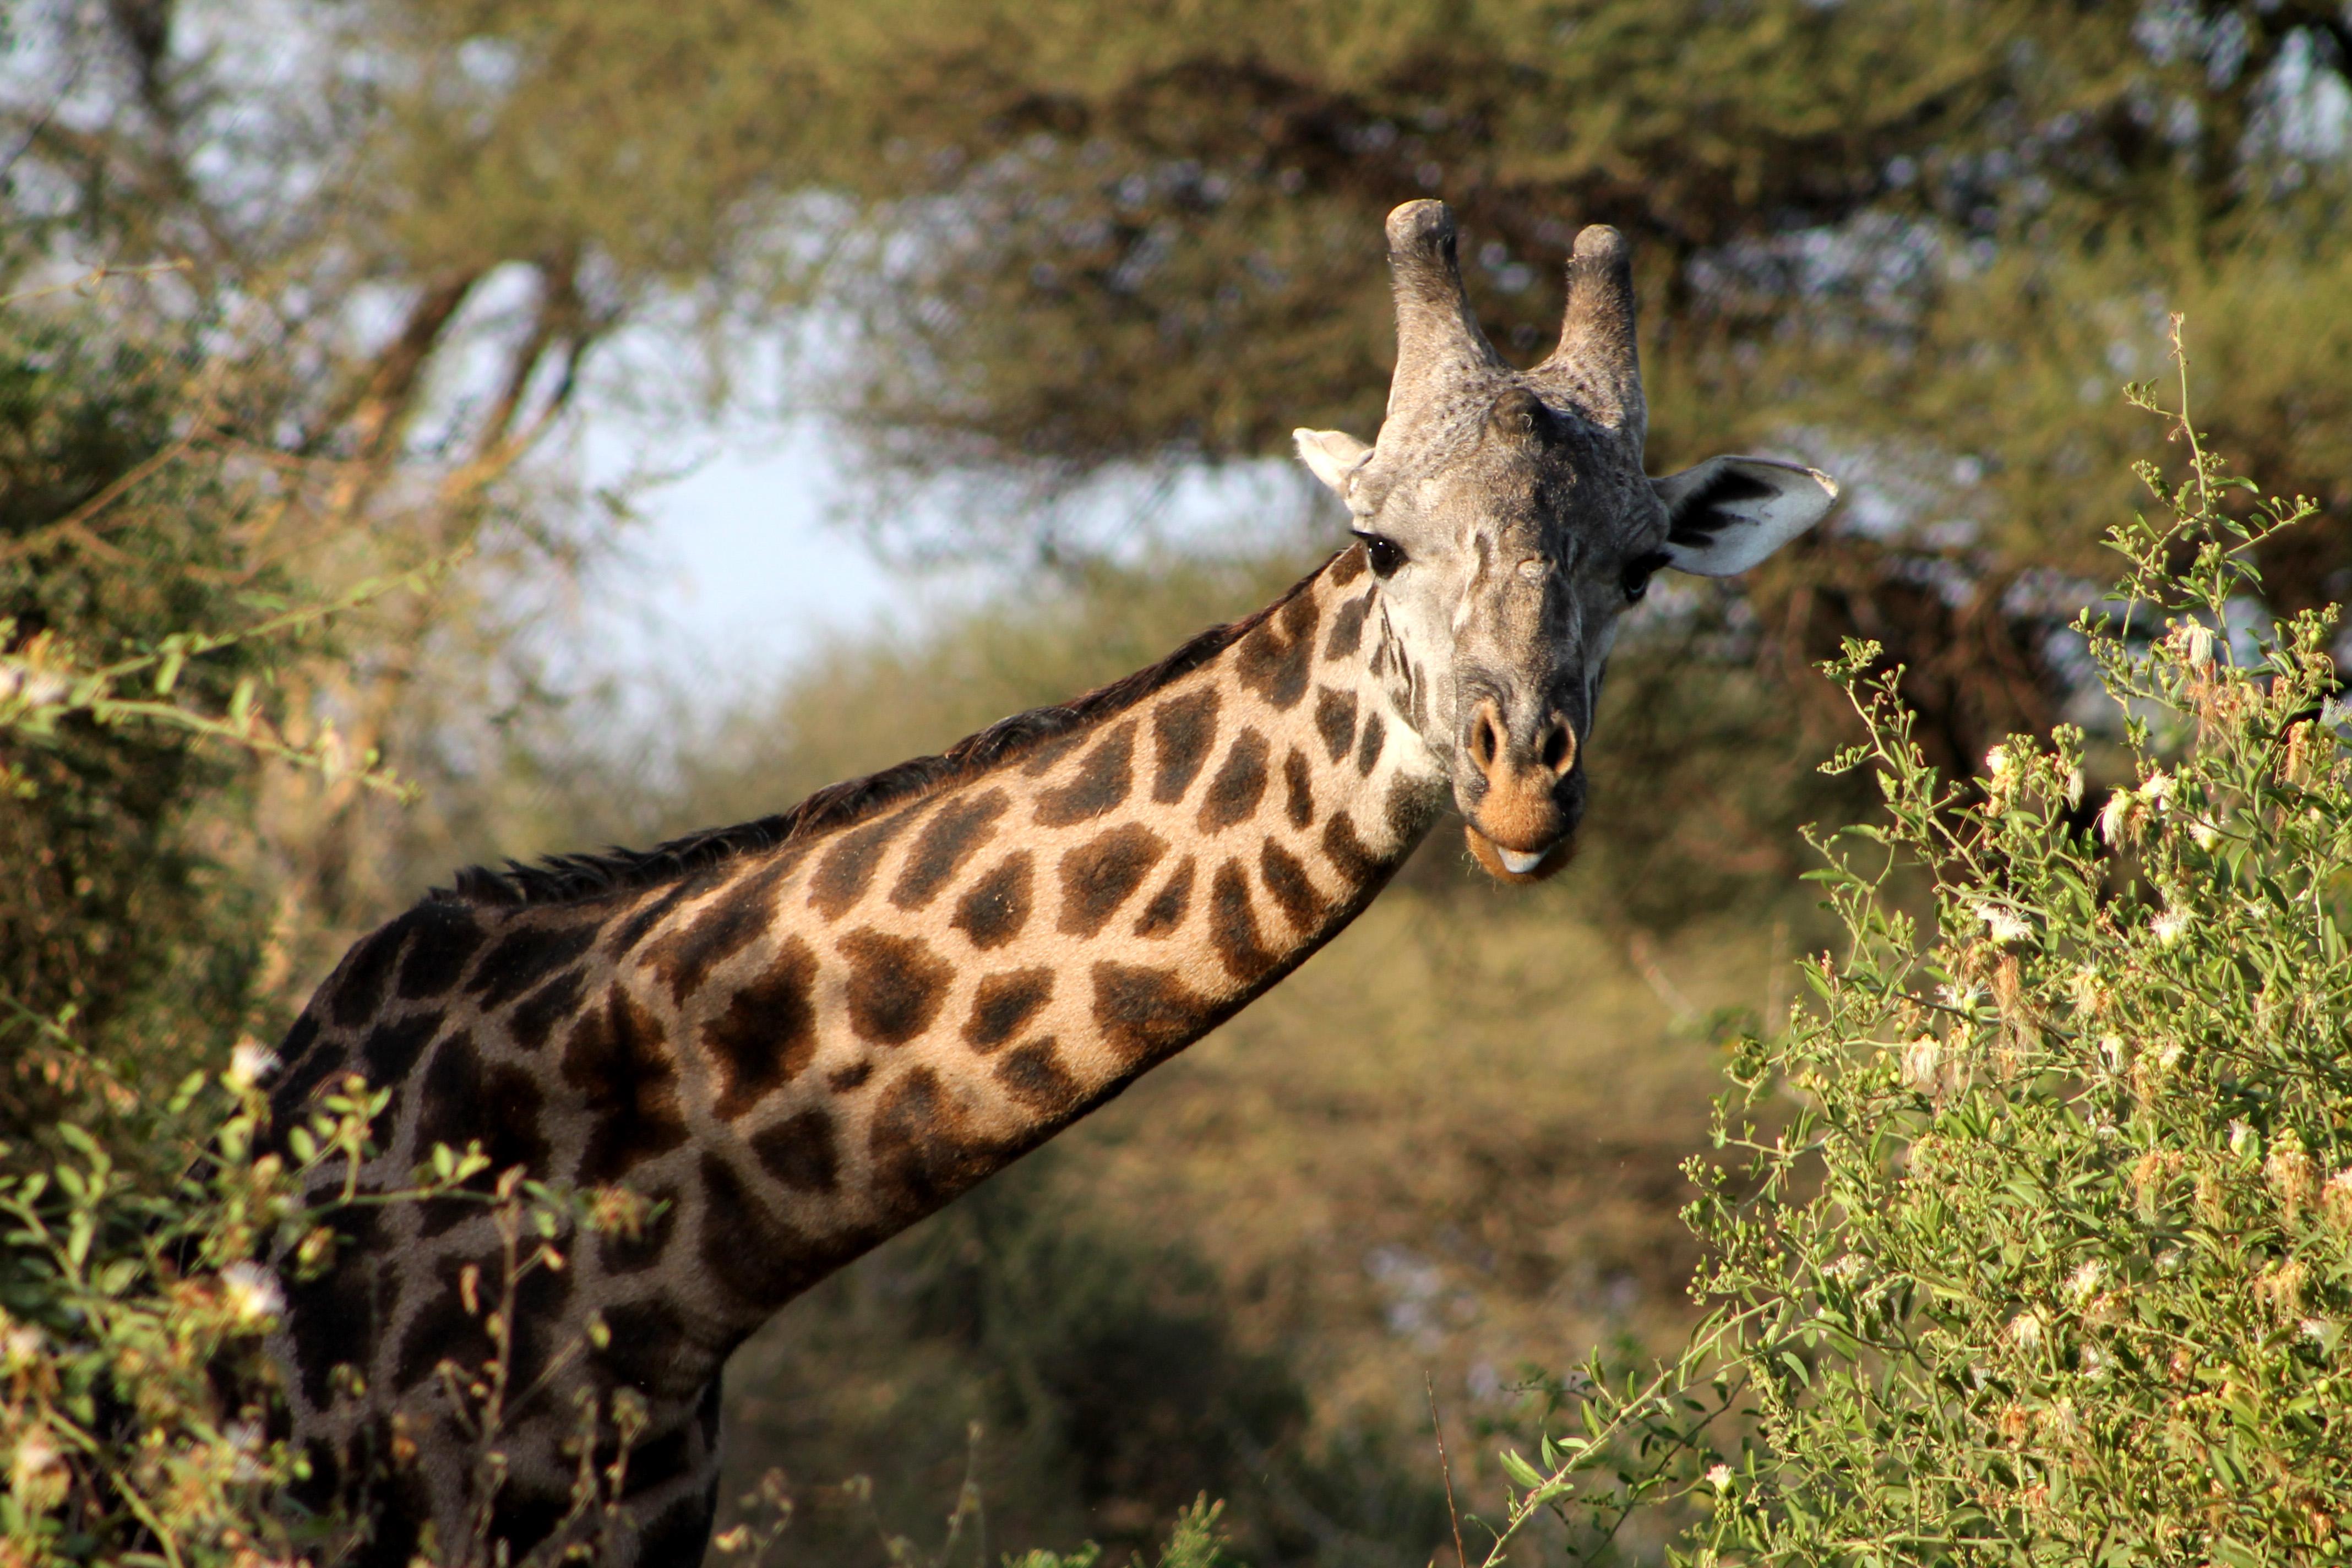 safari Tanzania Off the beaten track. Meet giraffes in Lake Manyara National Park